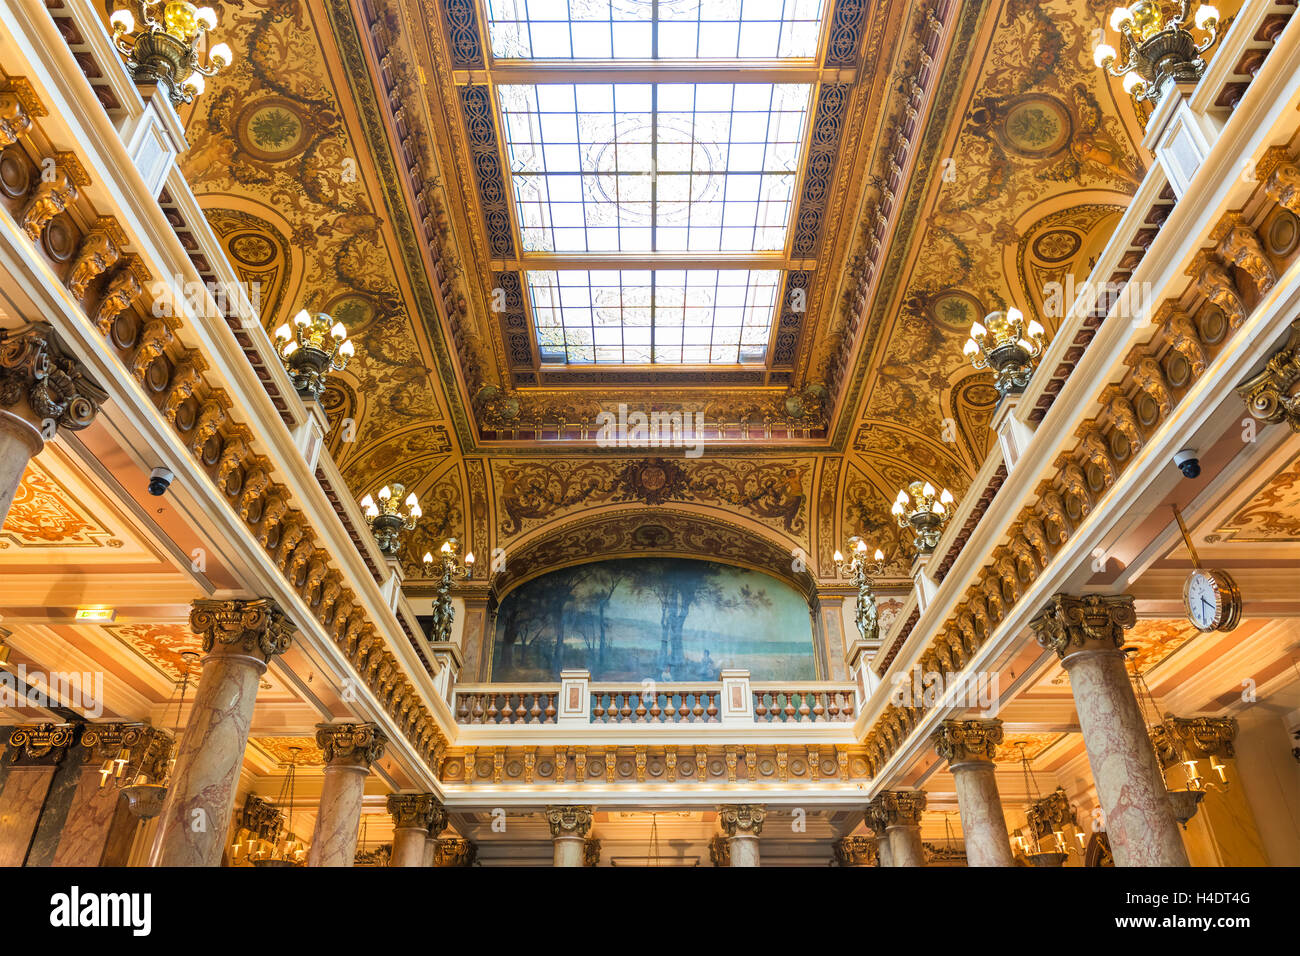 Casino-Interieur, Monte Carlo, Monaco Stockfoto, Bild: 123235520 - Alamy